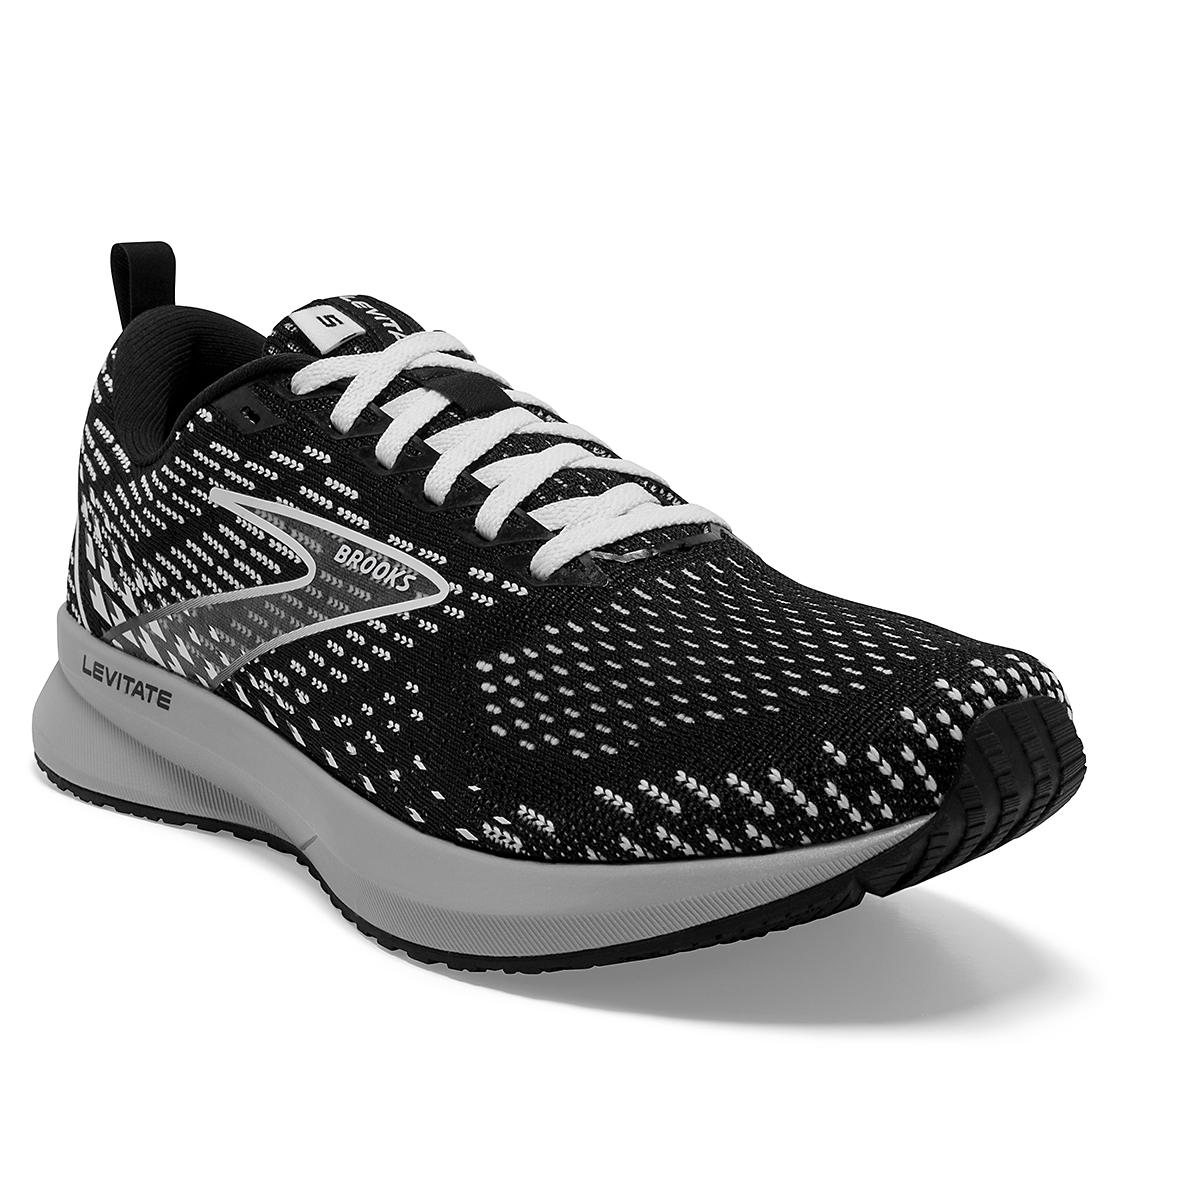 Women's Brooks Levitate 5 Running Shoe - Color: Black/Grey/White - Size: 5 - Width: Regular, Black/Grey/White, large, image 2